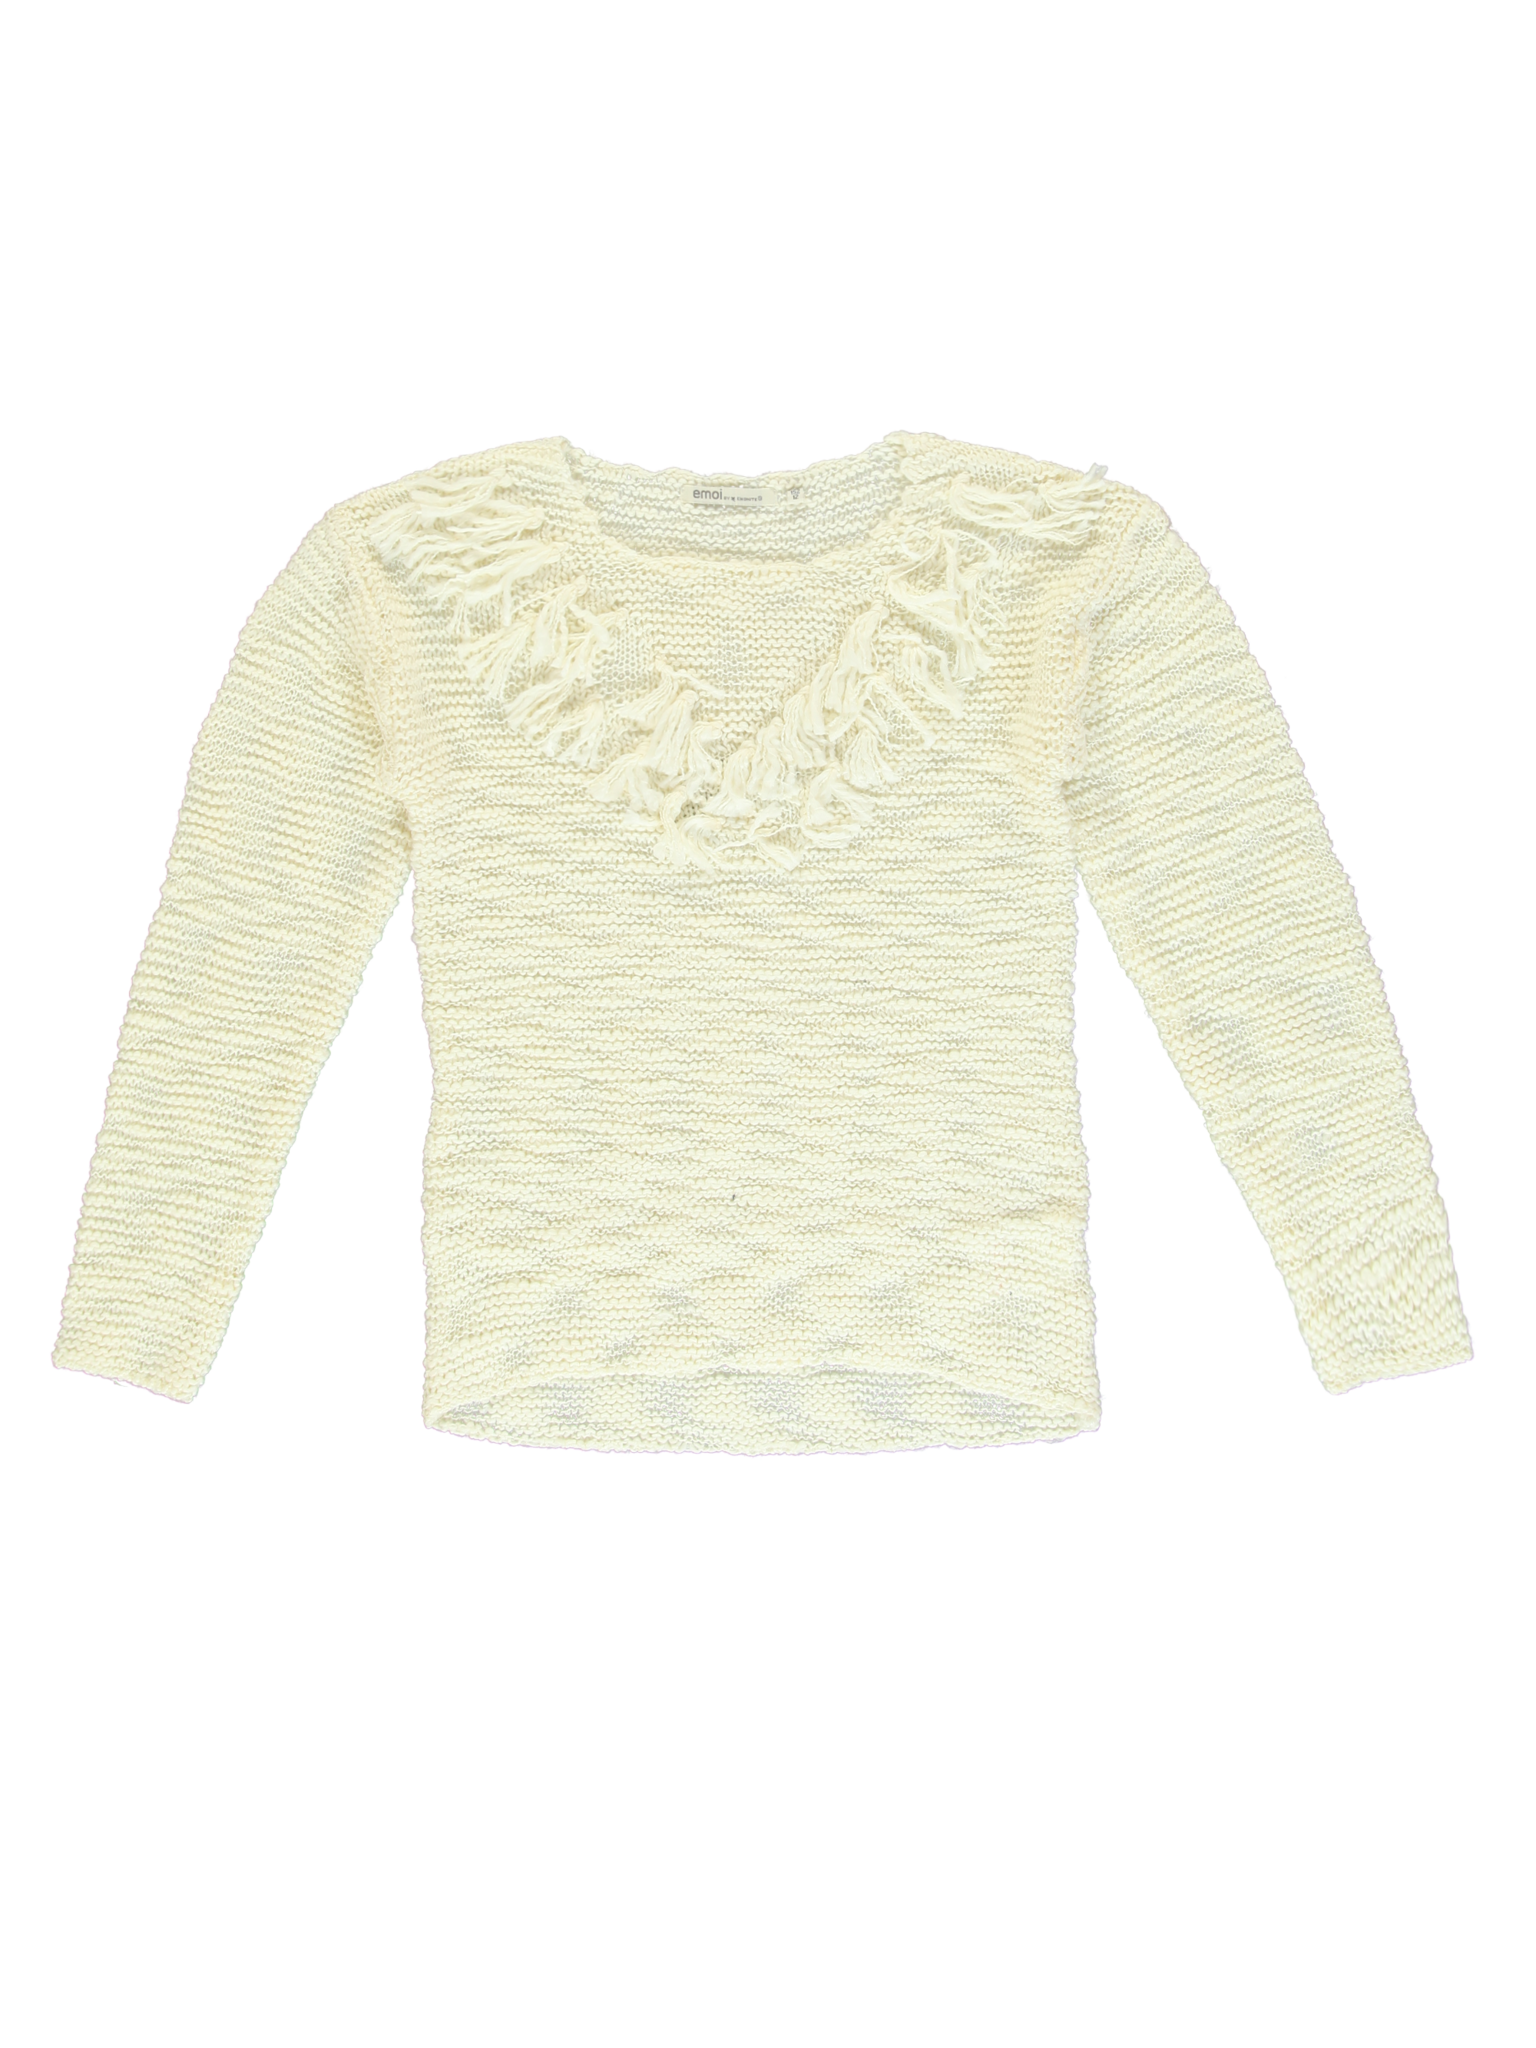 All Brands | Winterproducts Teen Girls | Pull | 16 pcs/box